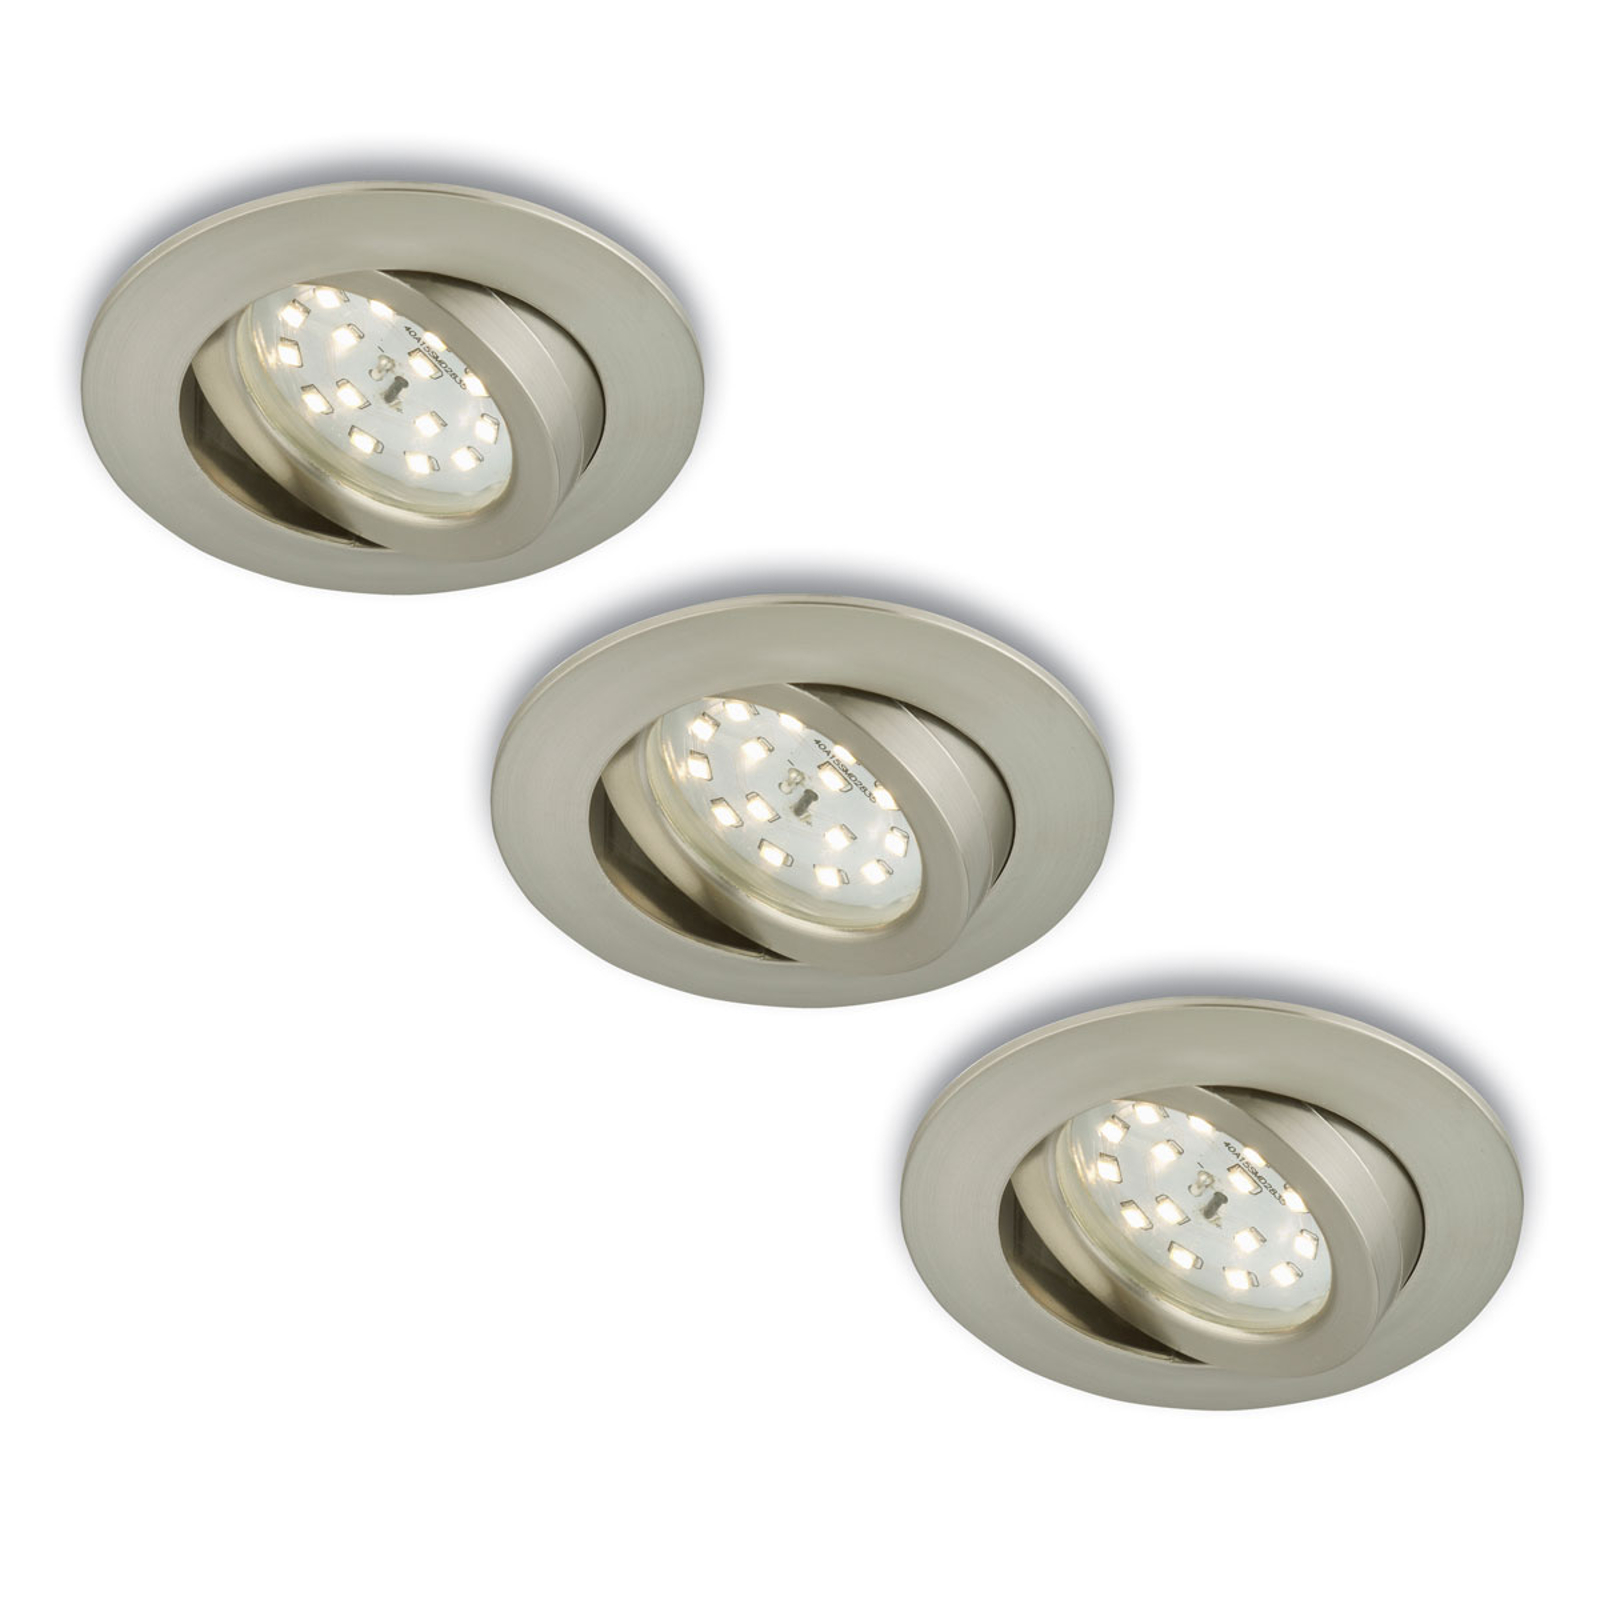 Rotatab. LED recessed light, set of 3, matt nickel_1510288_1